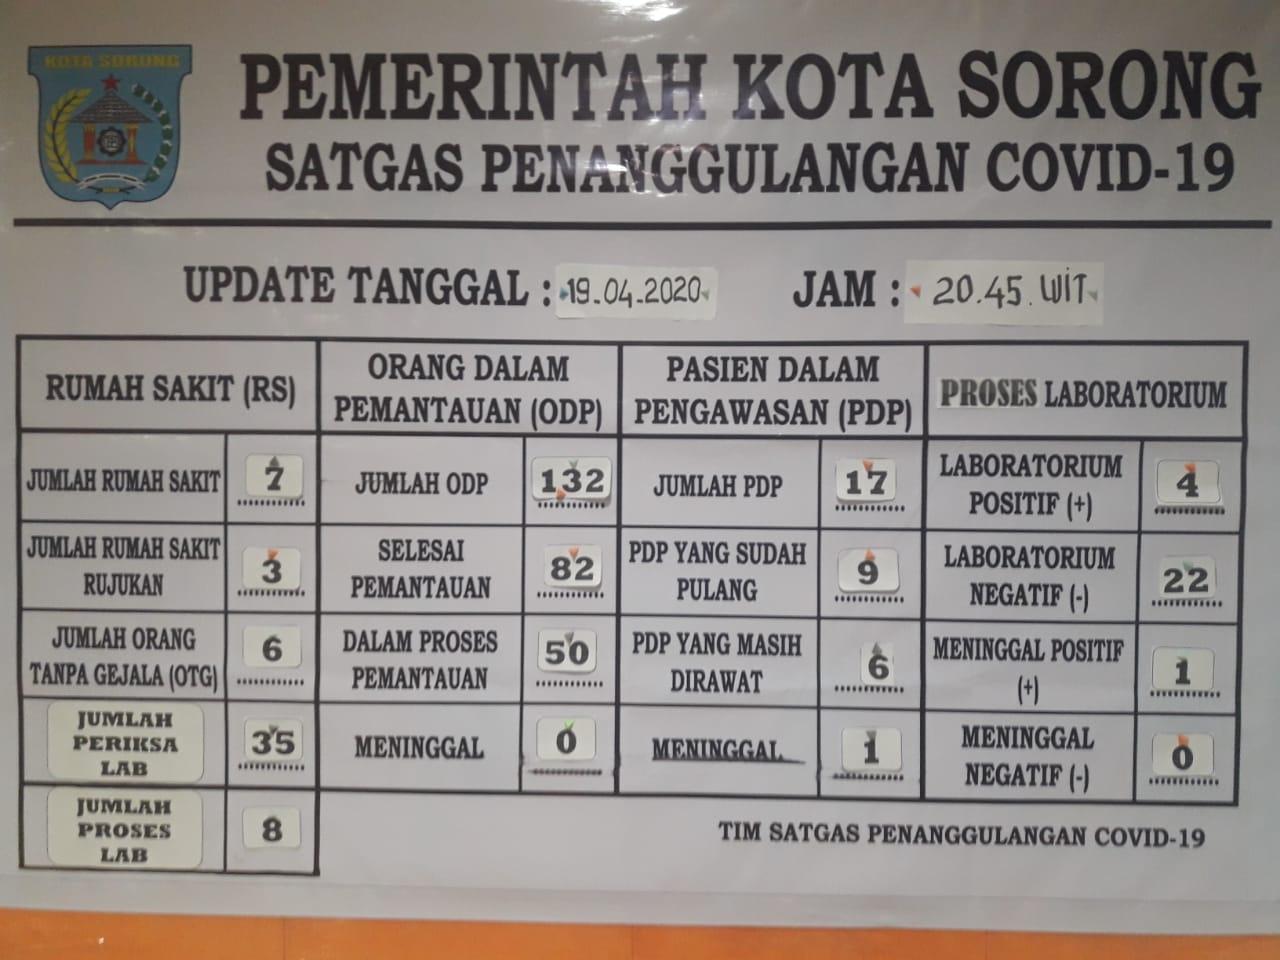 Warga Patut Waspada, Kota Sorong Jadi Transmisi Lokal Covid-19 23 IMG 20200420 WA0005 1